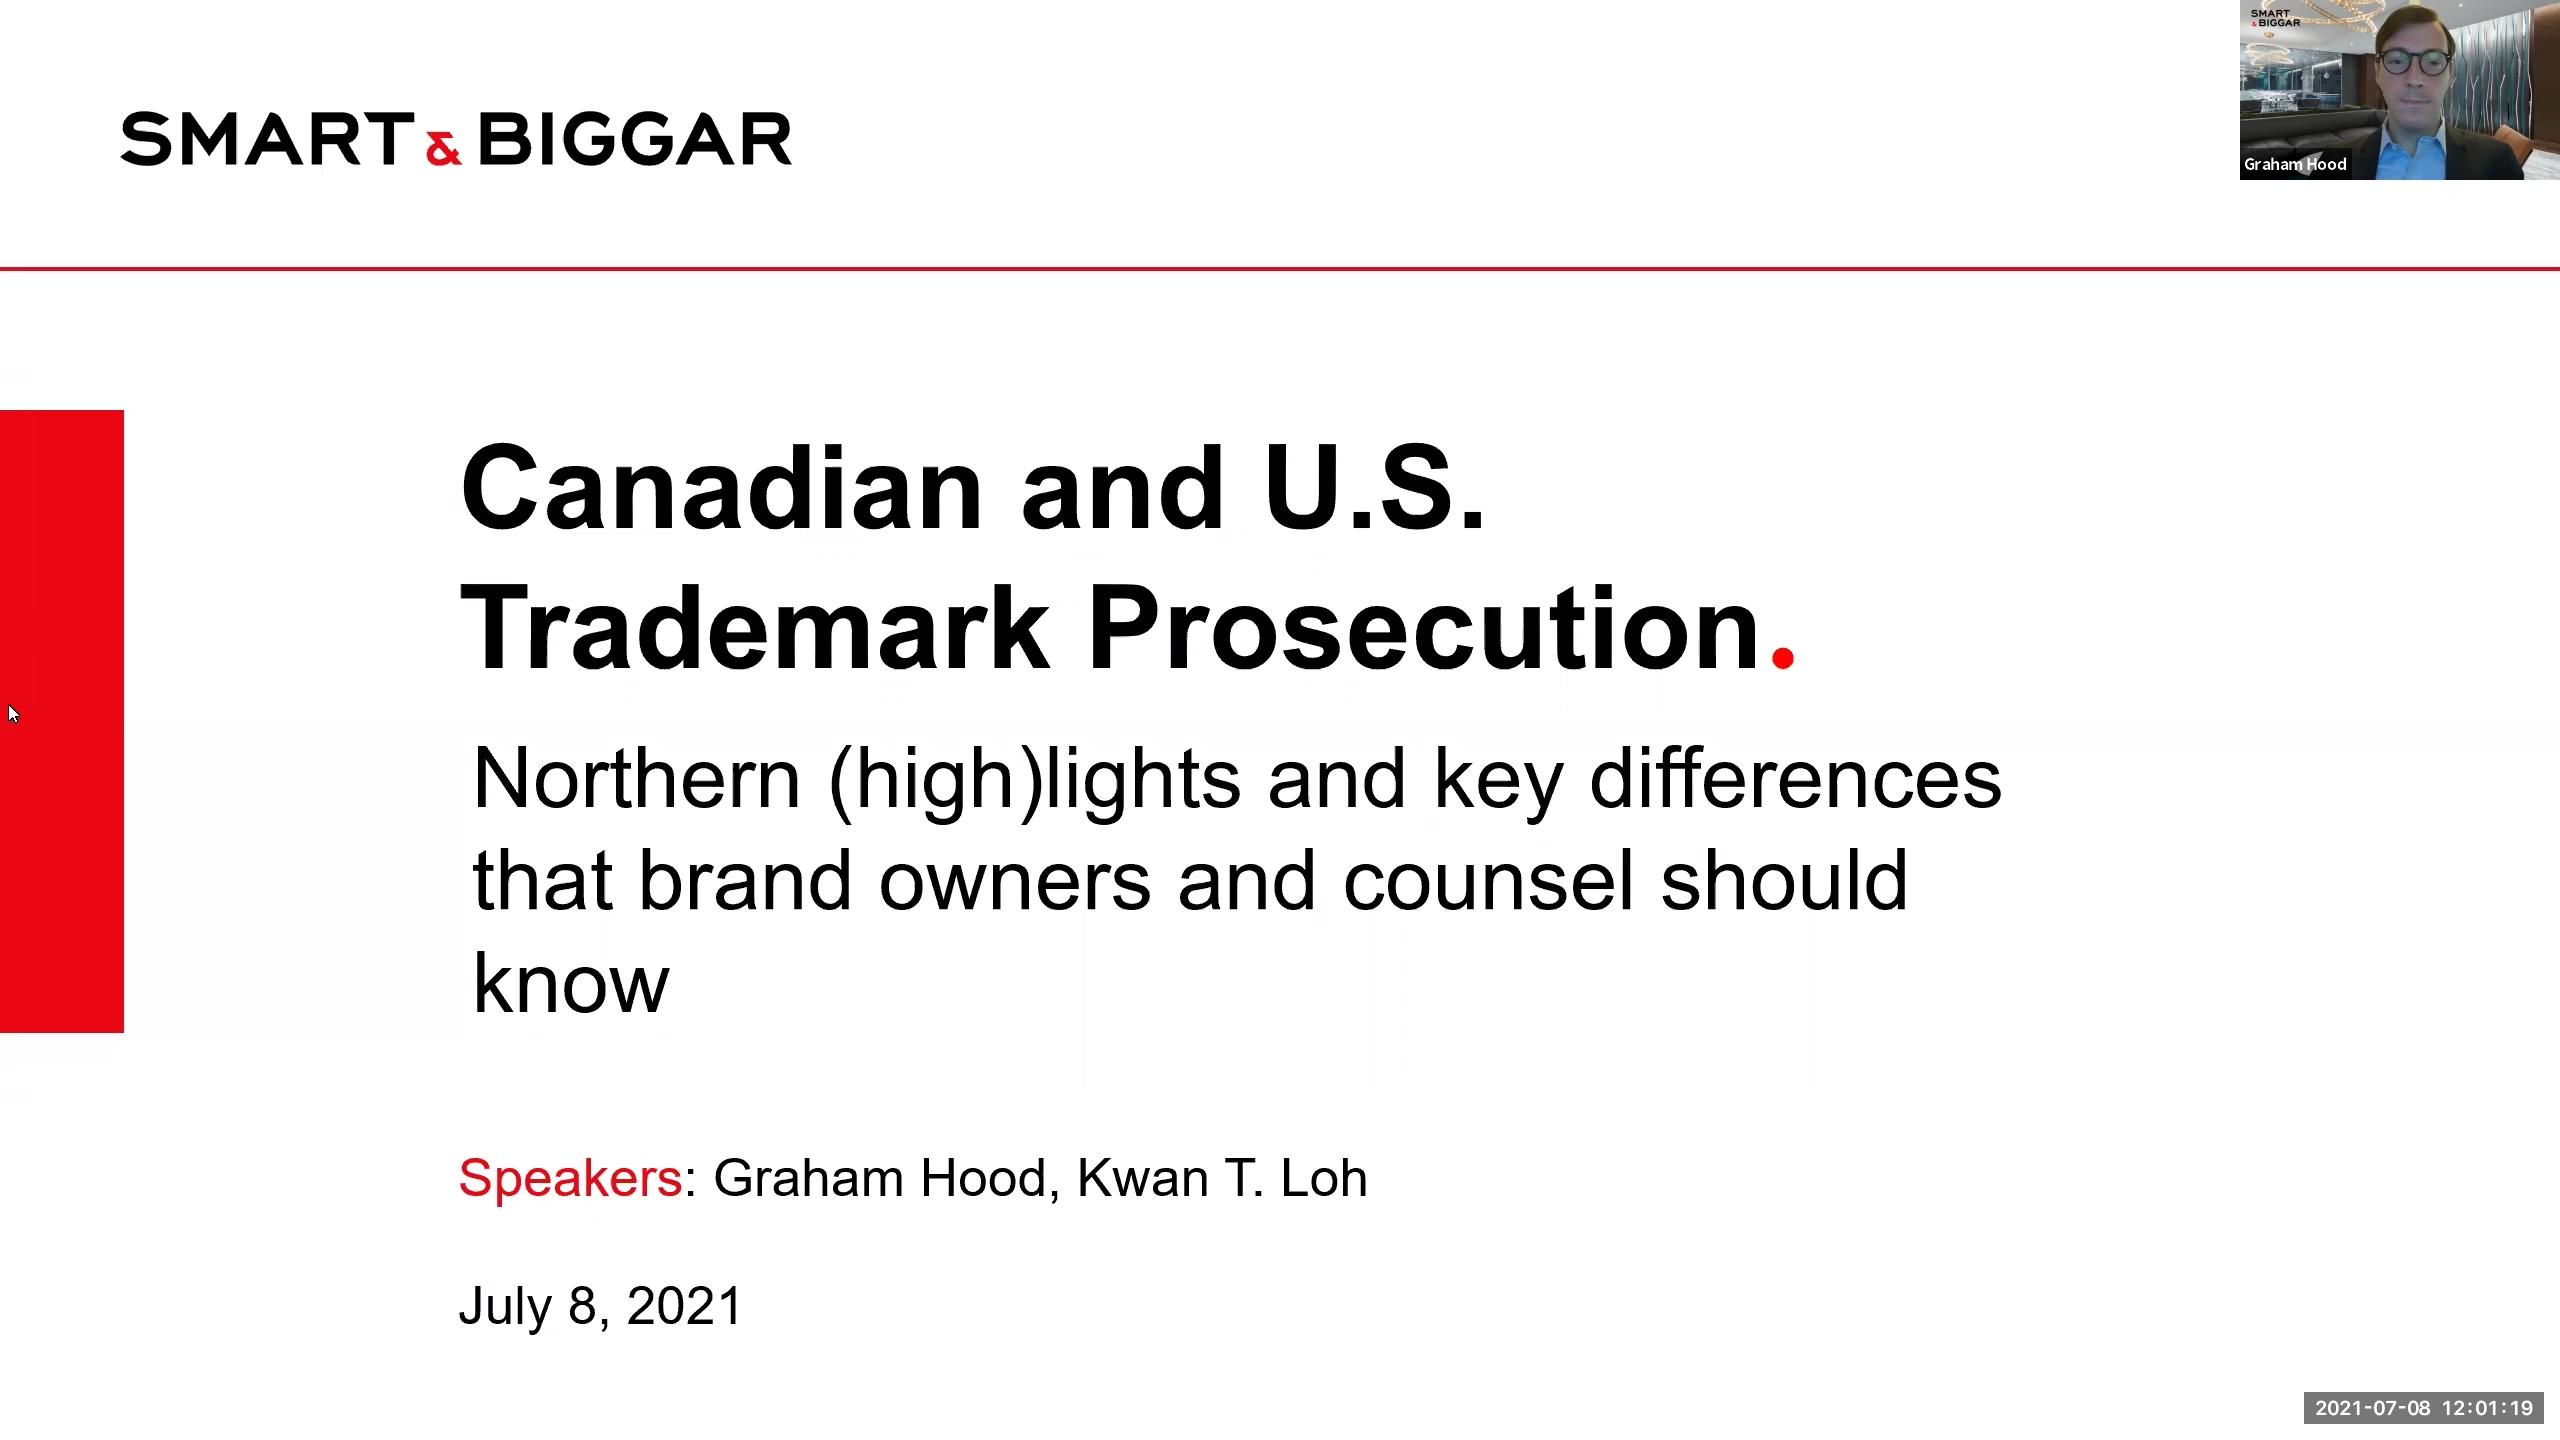 Canadian and U.S. Trademark Prosecution